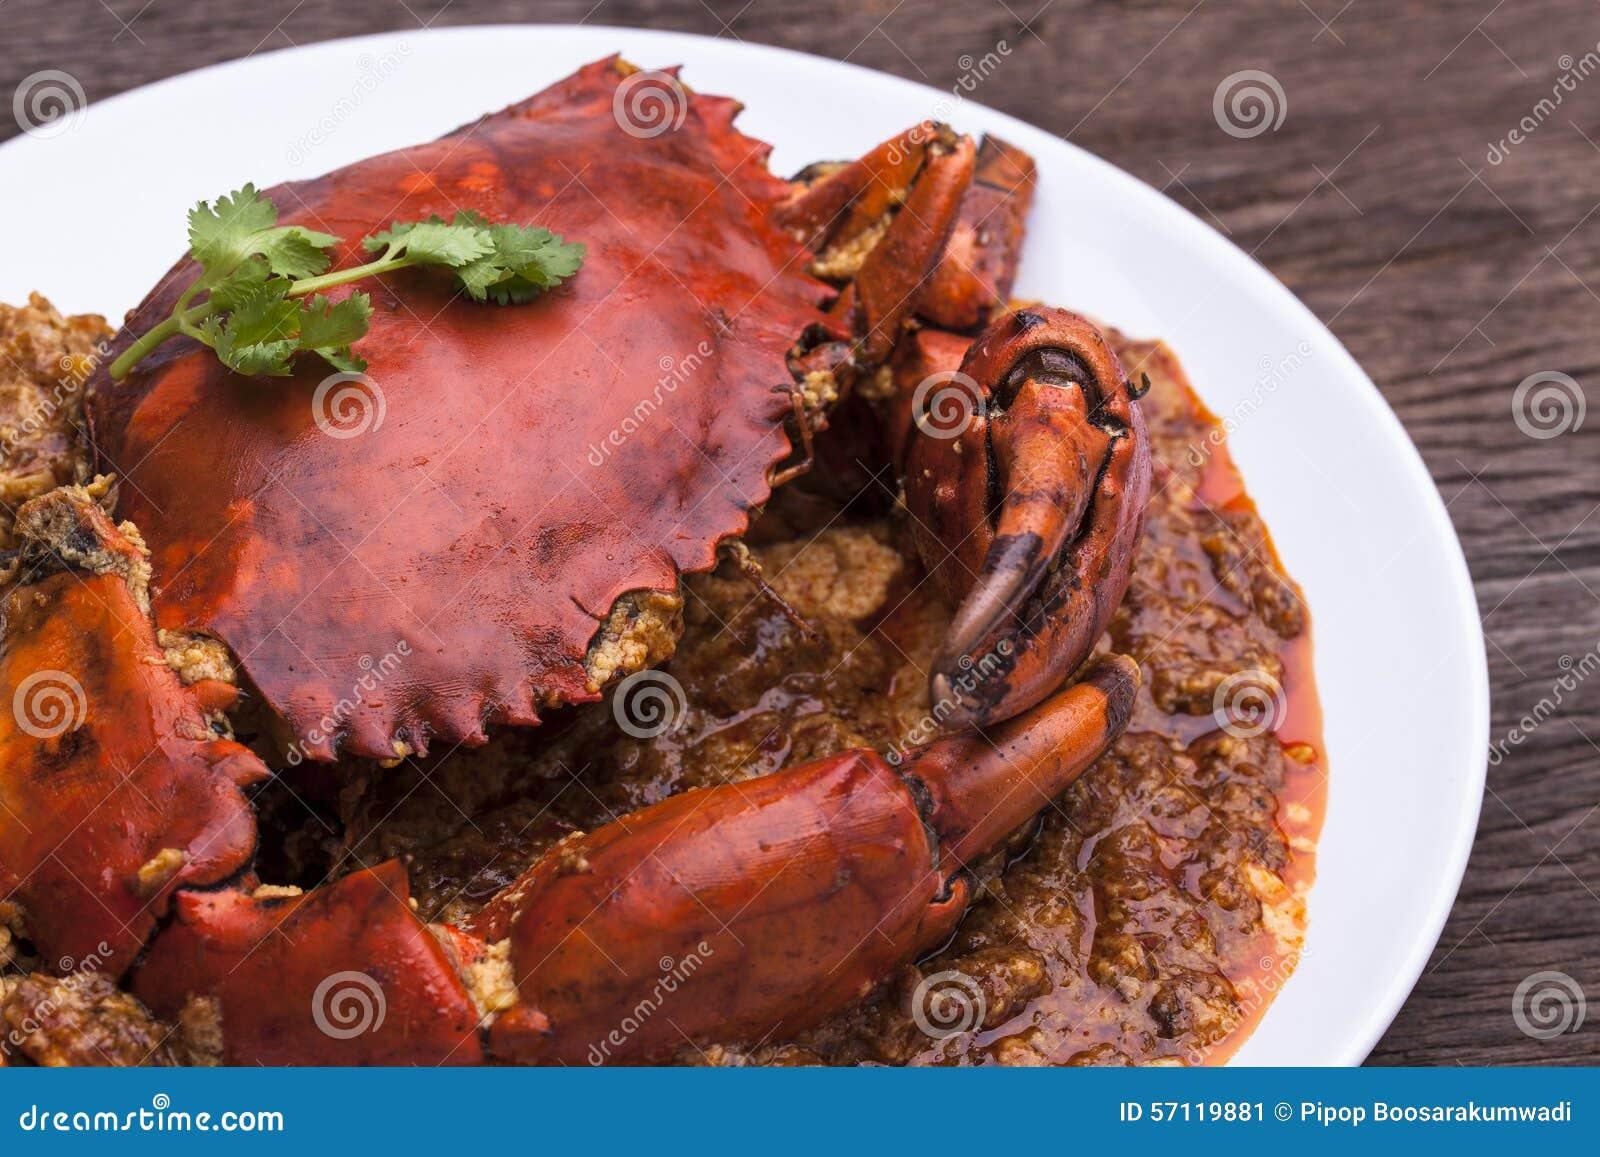 Chilli crab asia cuisine stock image image of chef for Asian cuisine singapore